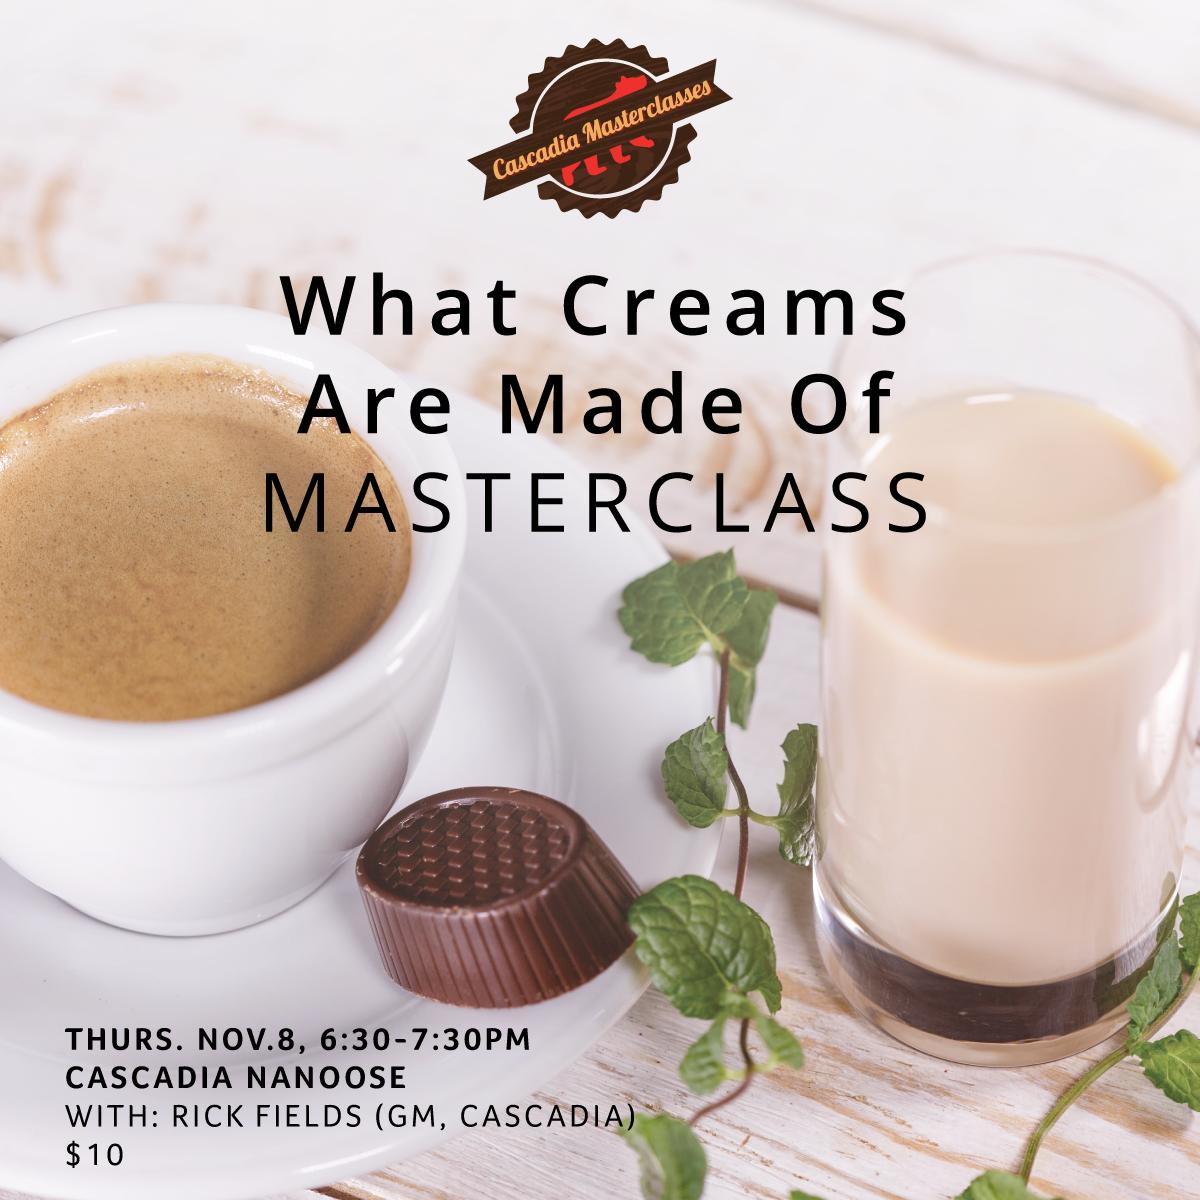 Cascadia Nanoose Masterclass_Nov 2018_web.png